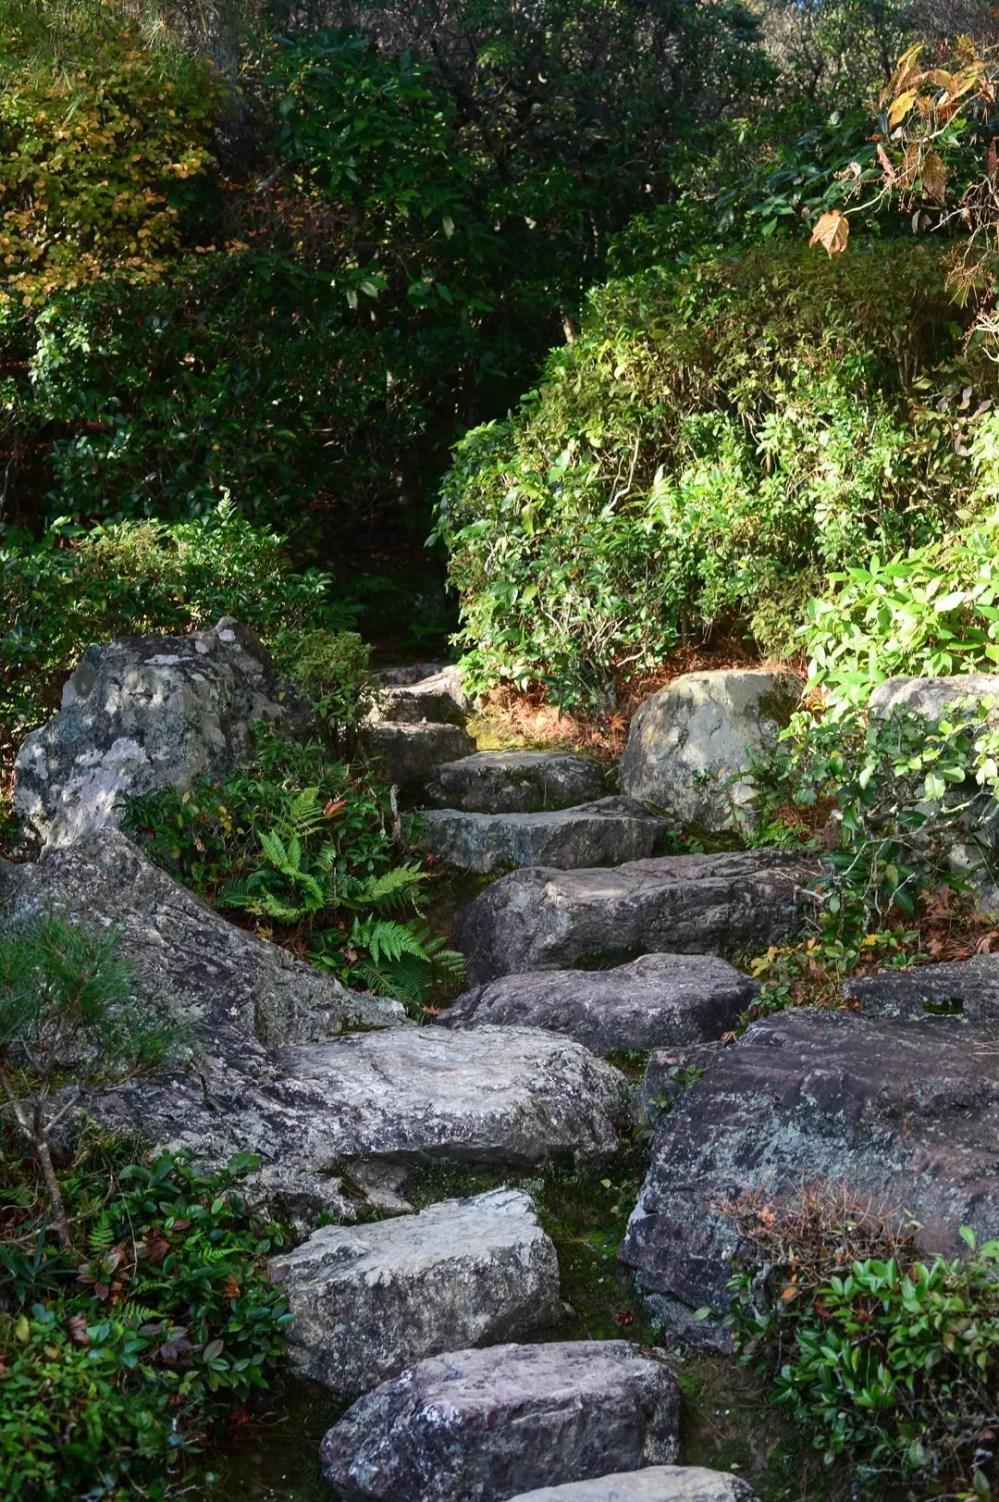 Okochi-Sanso-004 Okochi Sanso  -  Kyoto, Japan Japan Kyoto  Kyoto Japan Garden